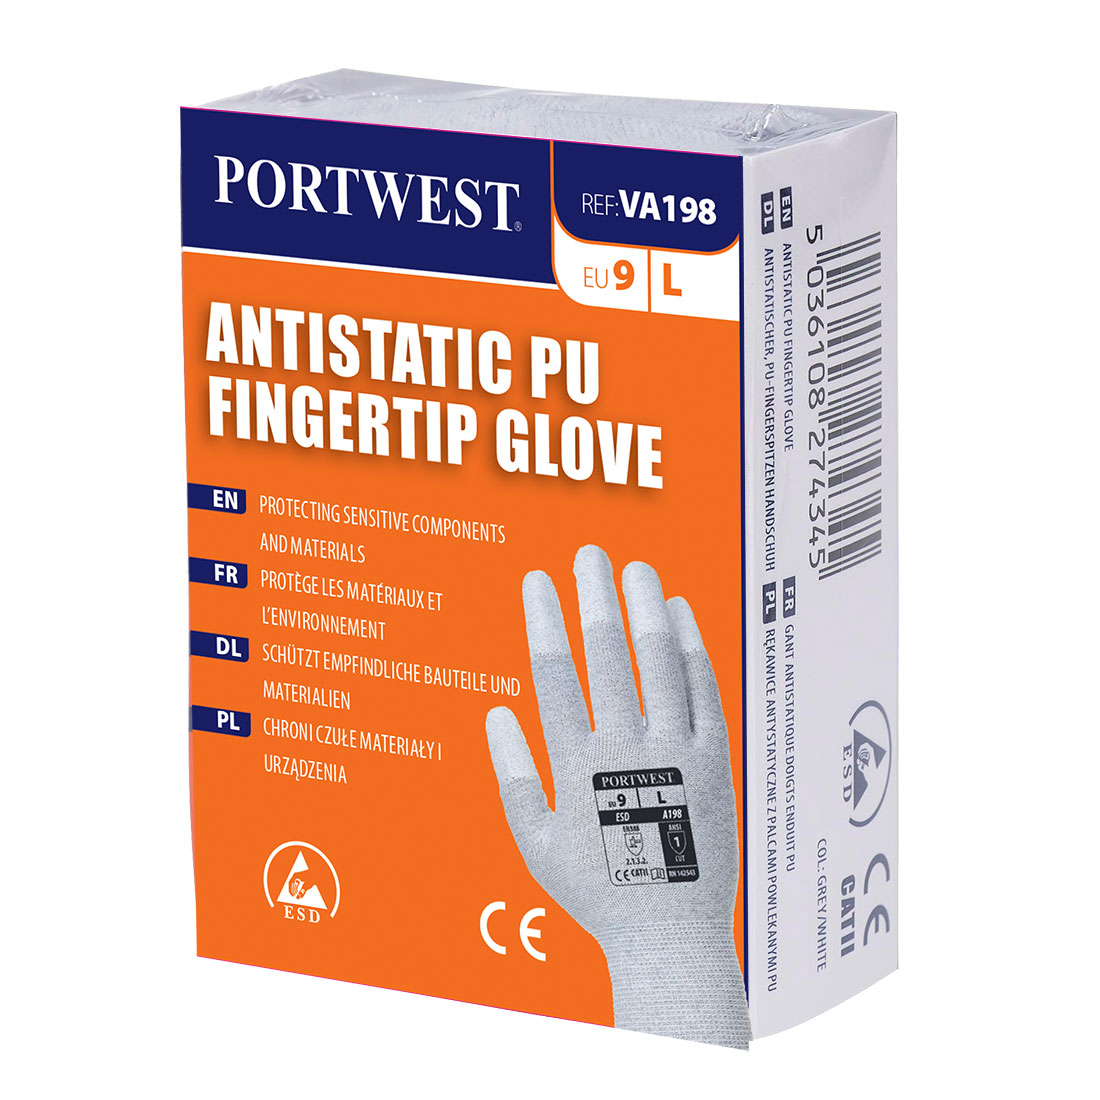 Portwest Vending Antistatic PU Fingertip Glove - VA198